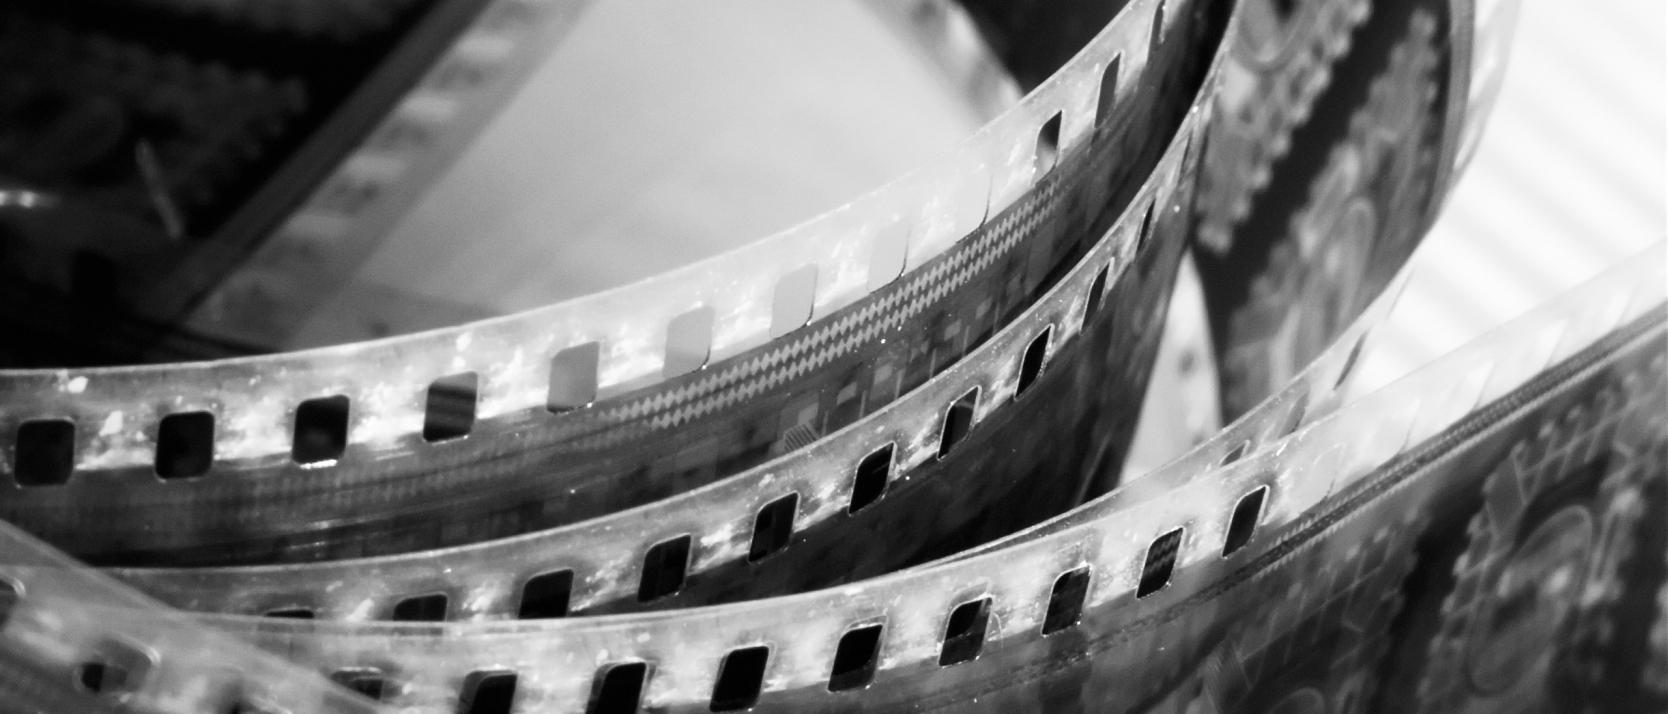 portion of movie film reel